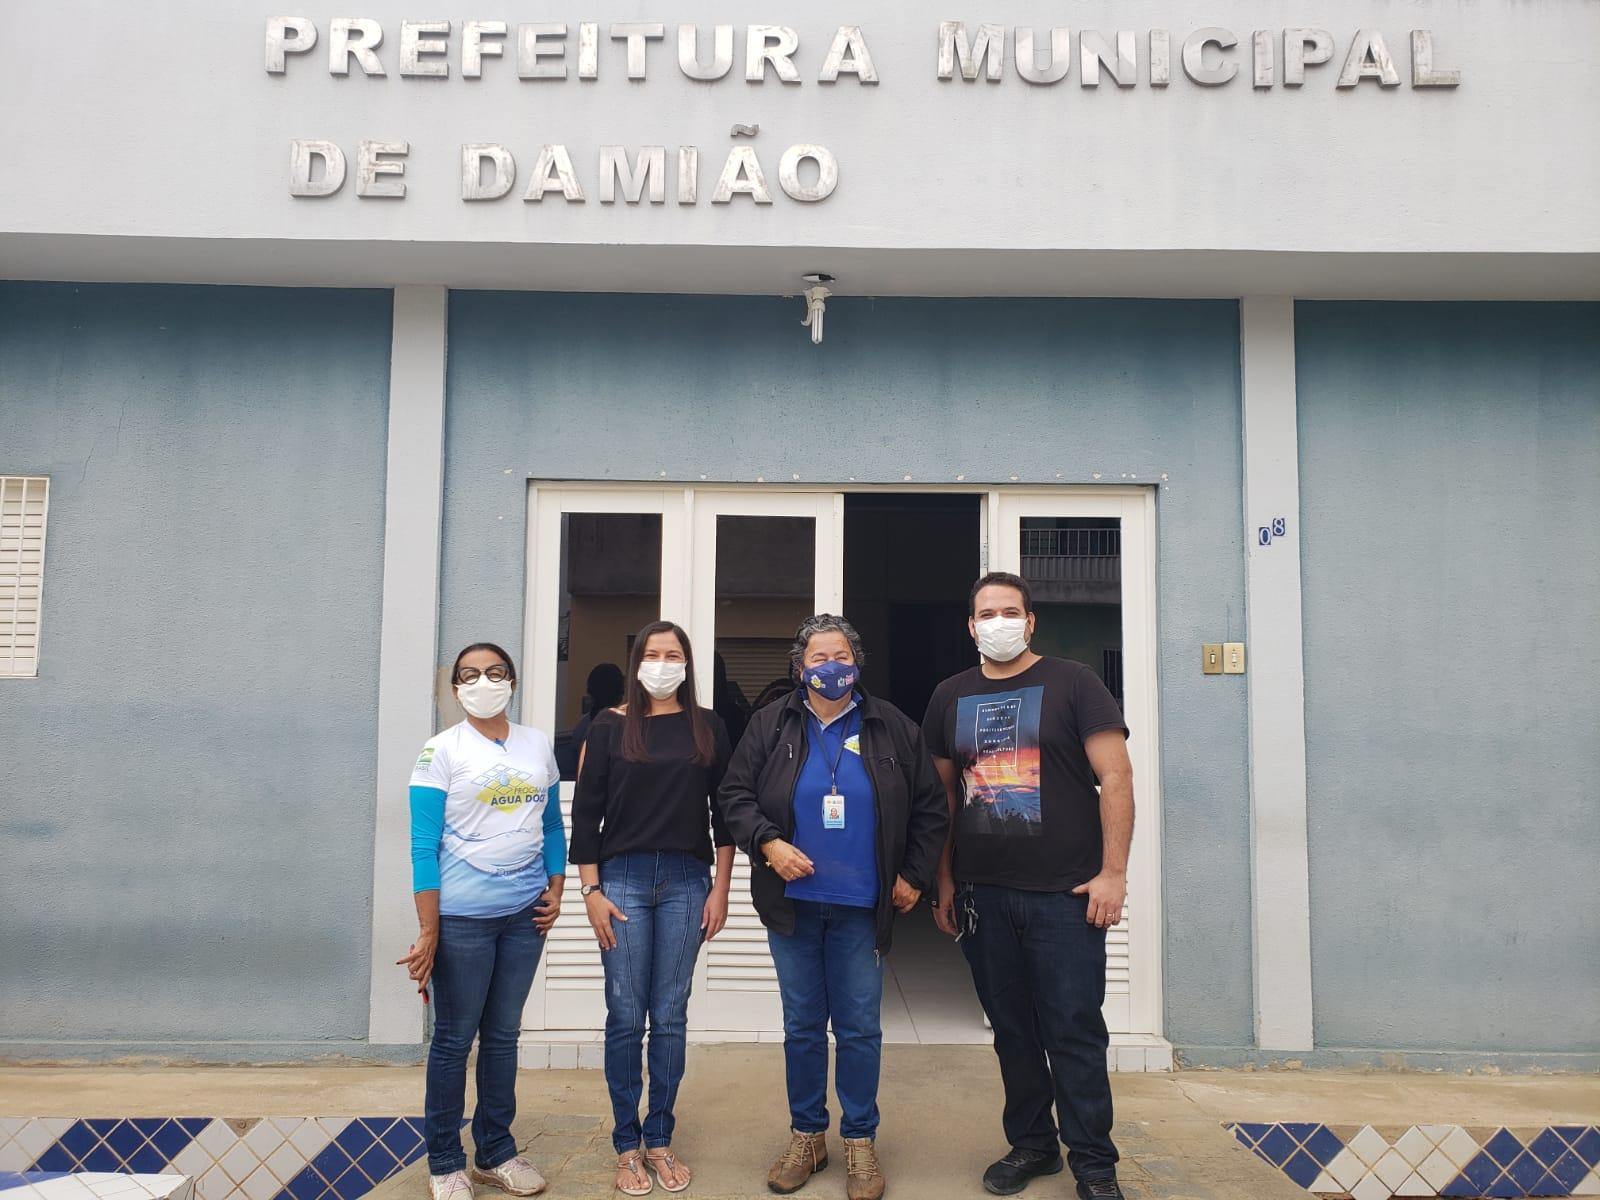 EQUIPE DO PROGRAMA ÁGUA DOCE REALIZA VISITA NA ZONA RURAL DE NOSSO MUNICÍPIO